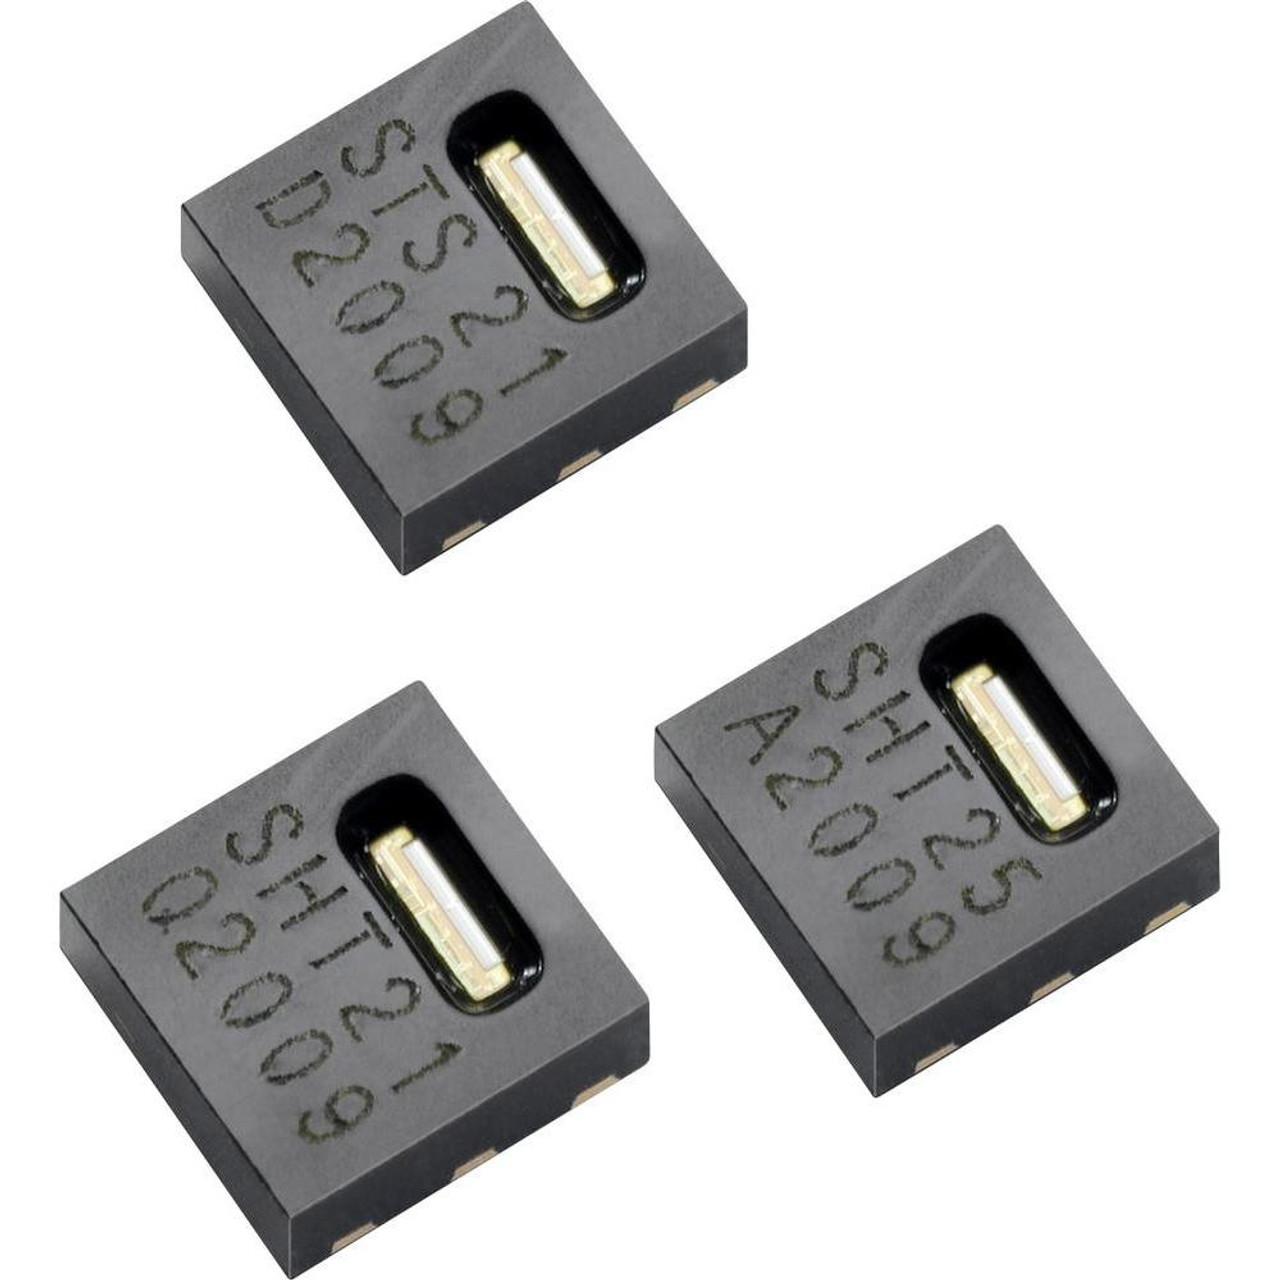 SHT25 - Digital Humidity and Temperature Sensor, Sensirion